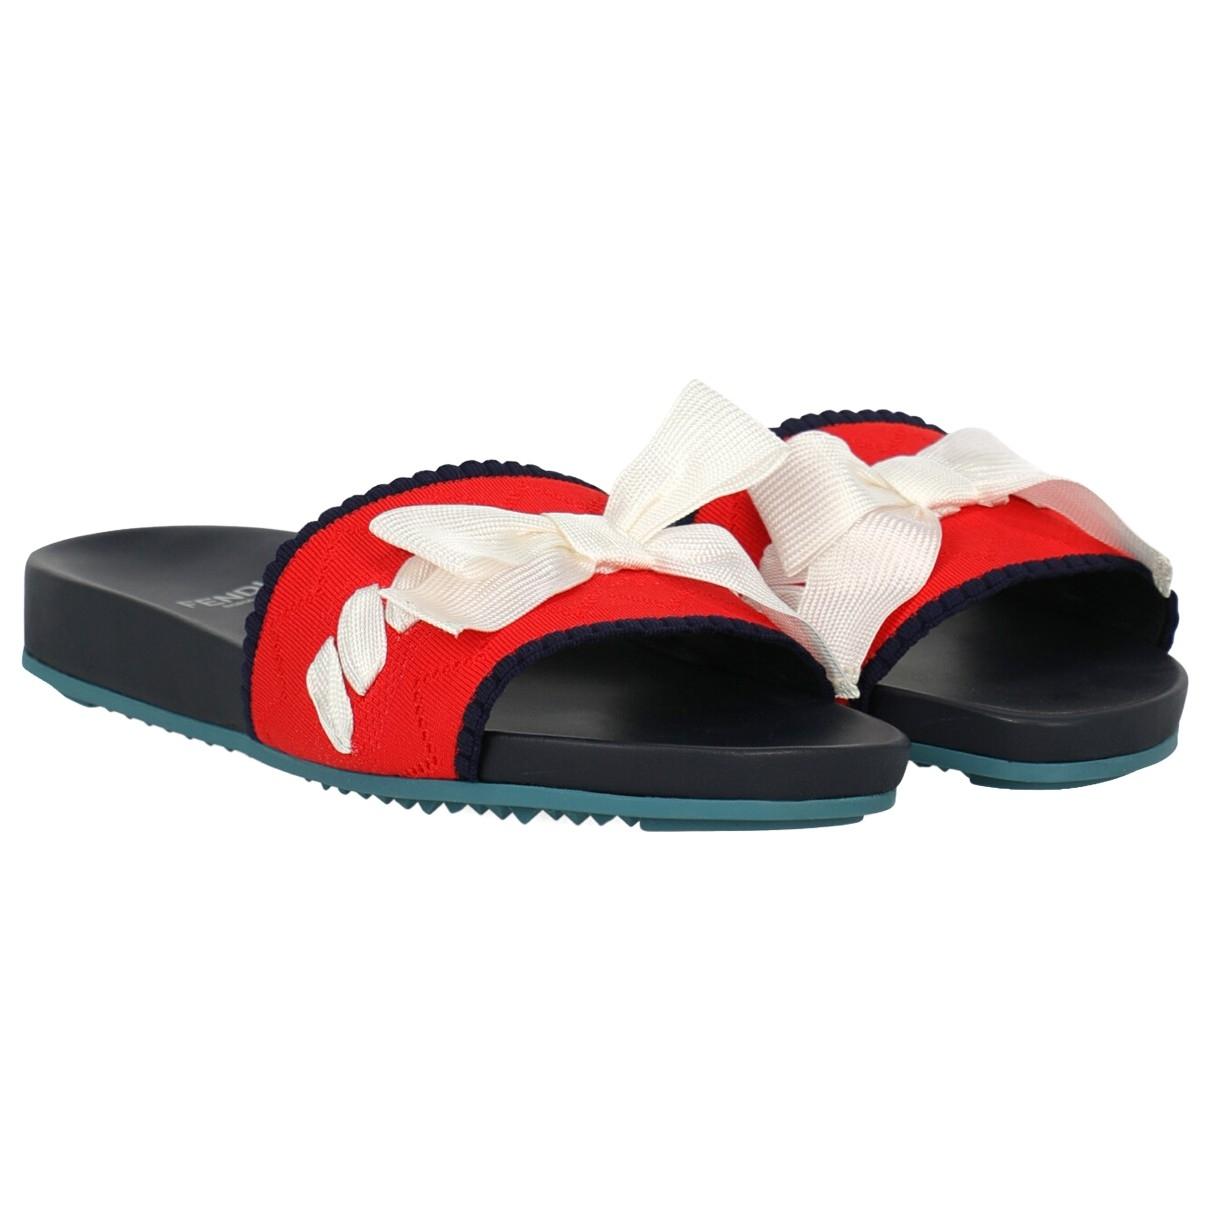 Fendi \N Red Cloth Sandals for Women 38.5 EU